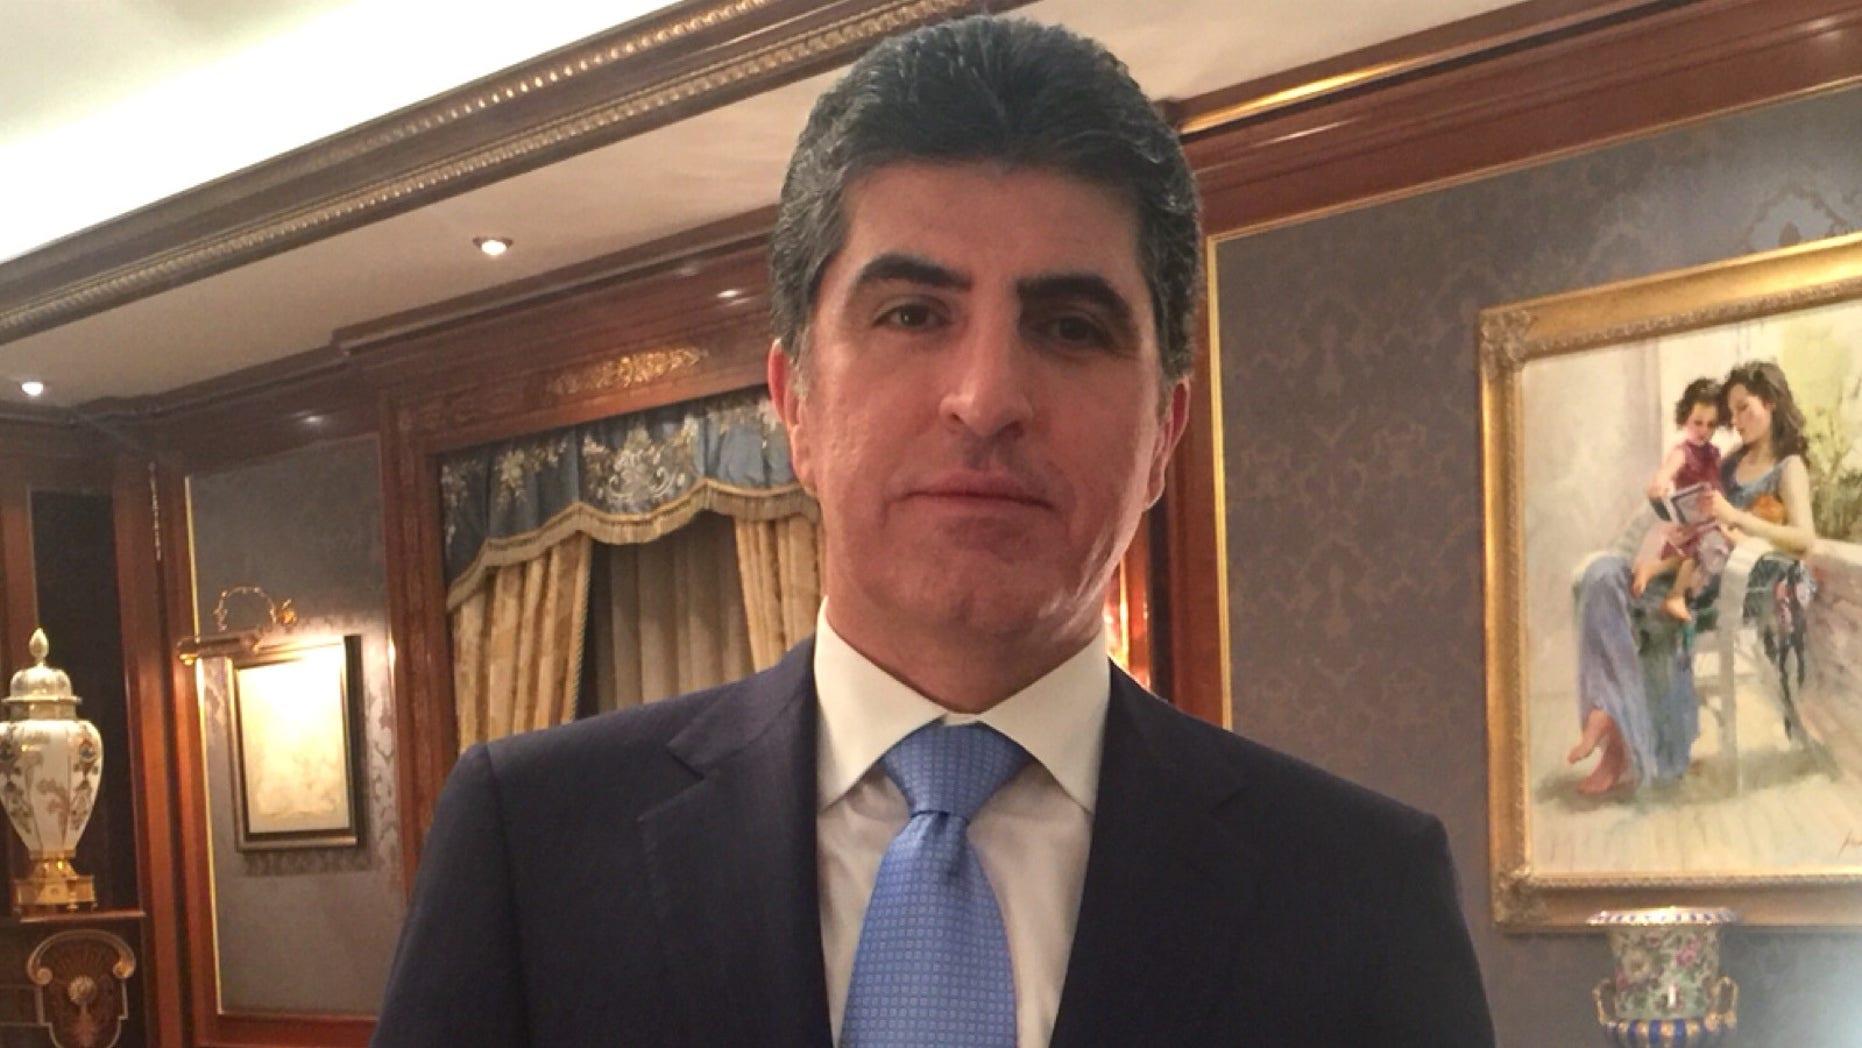 Kurdistan Regional Government Prime Minister Nechiravan Barzani